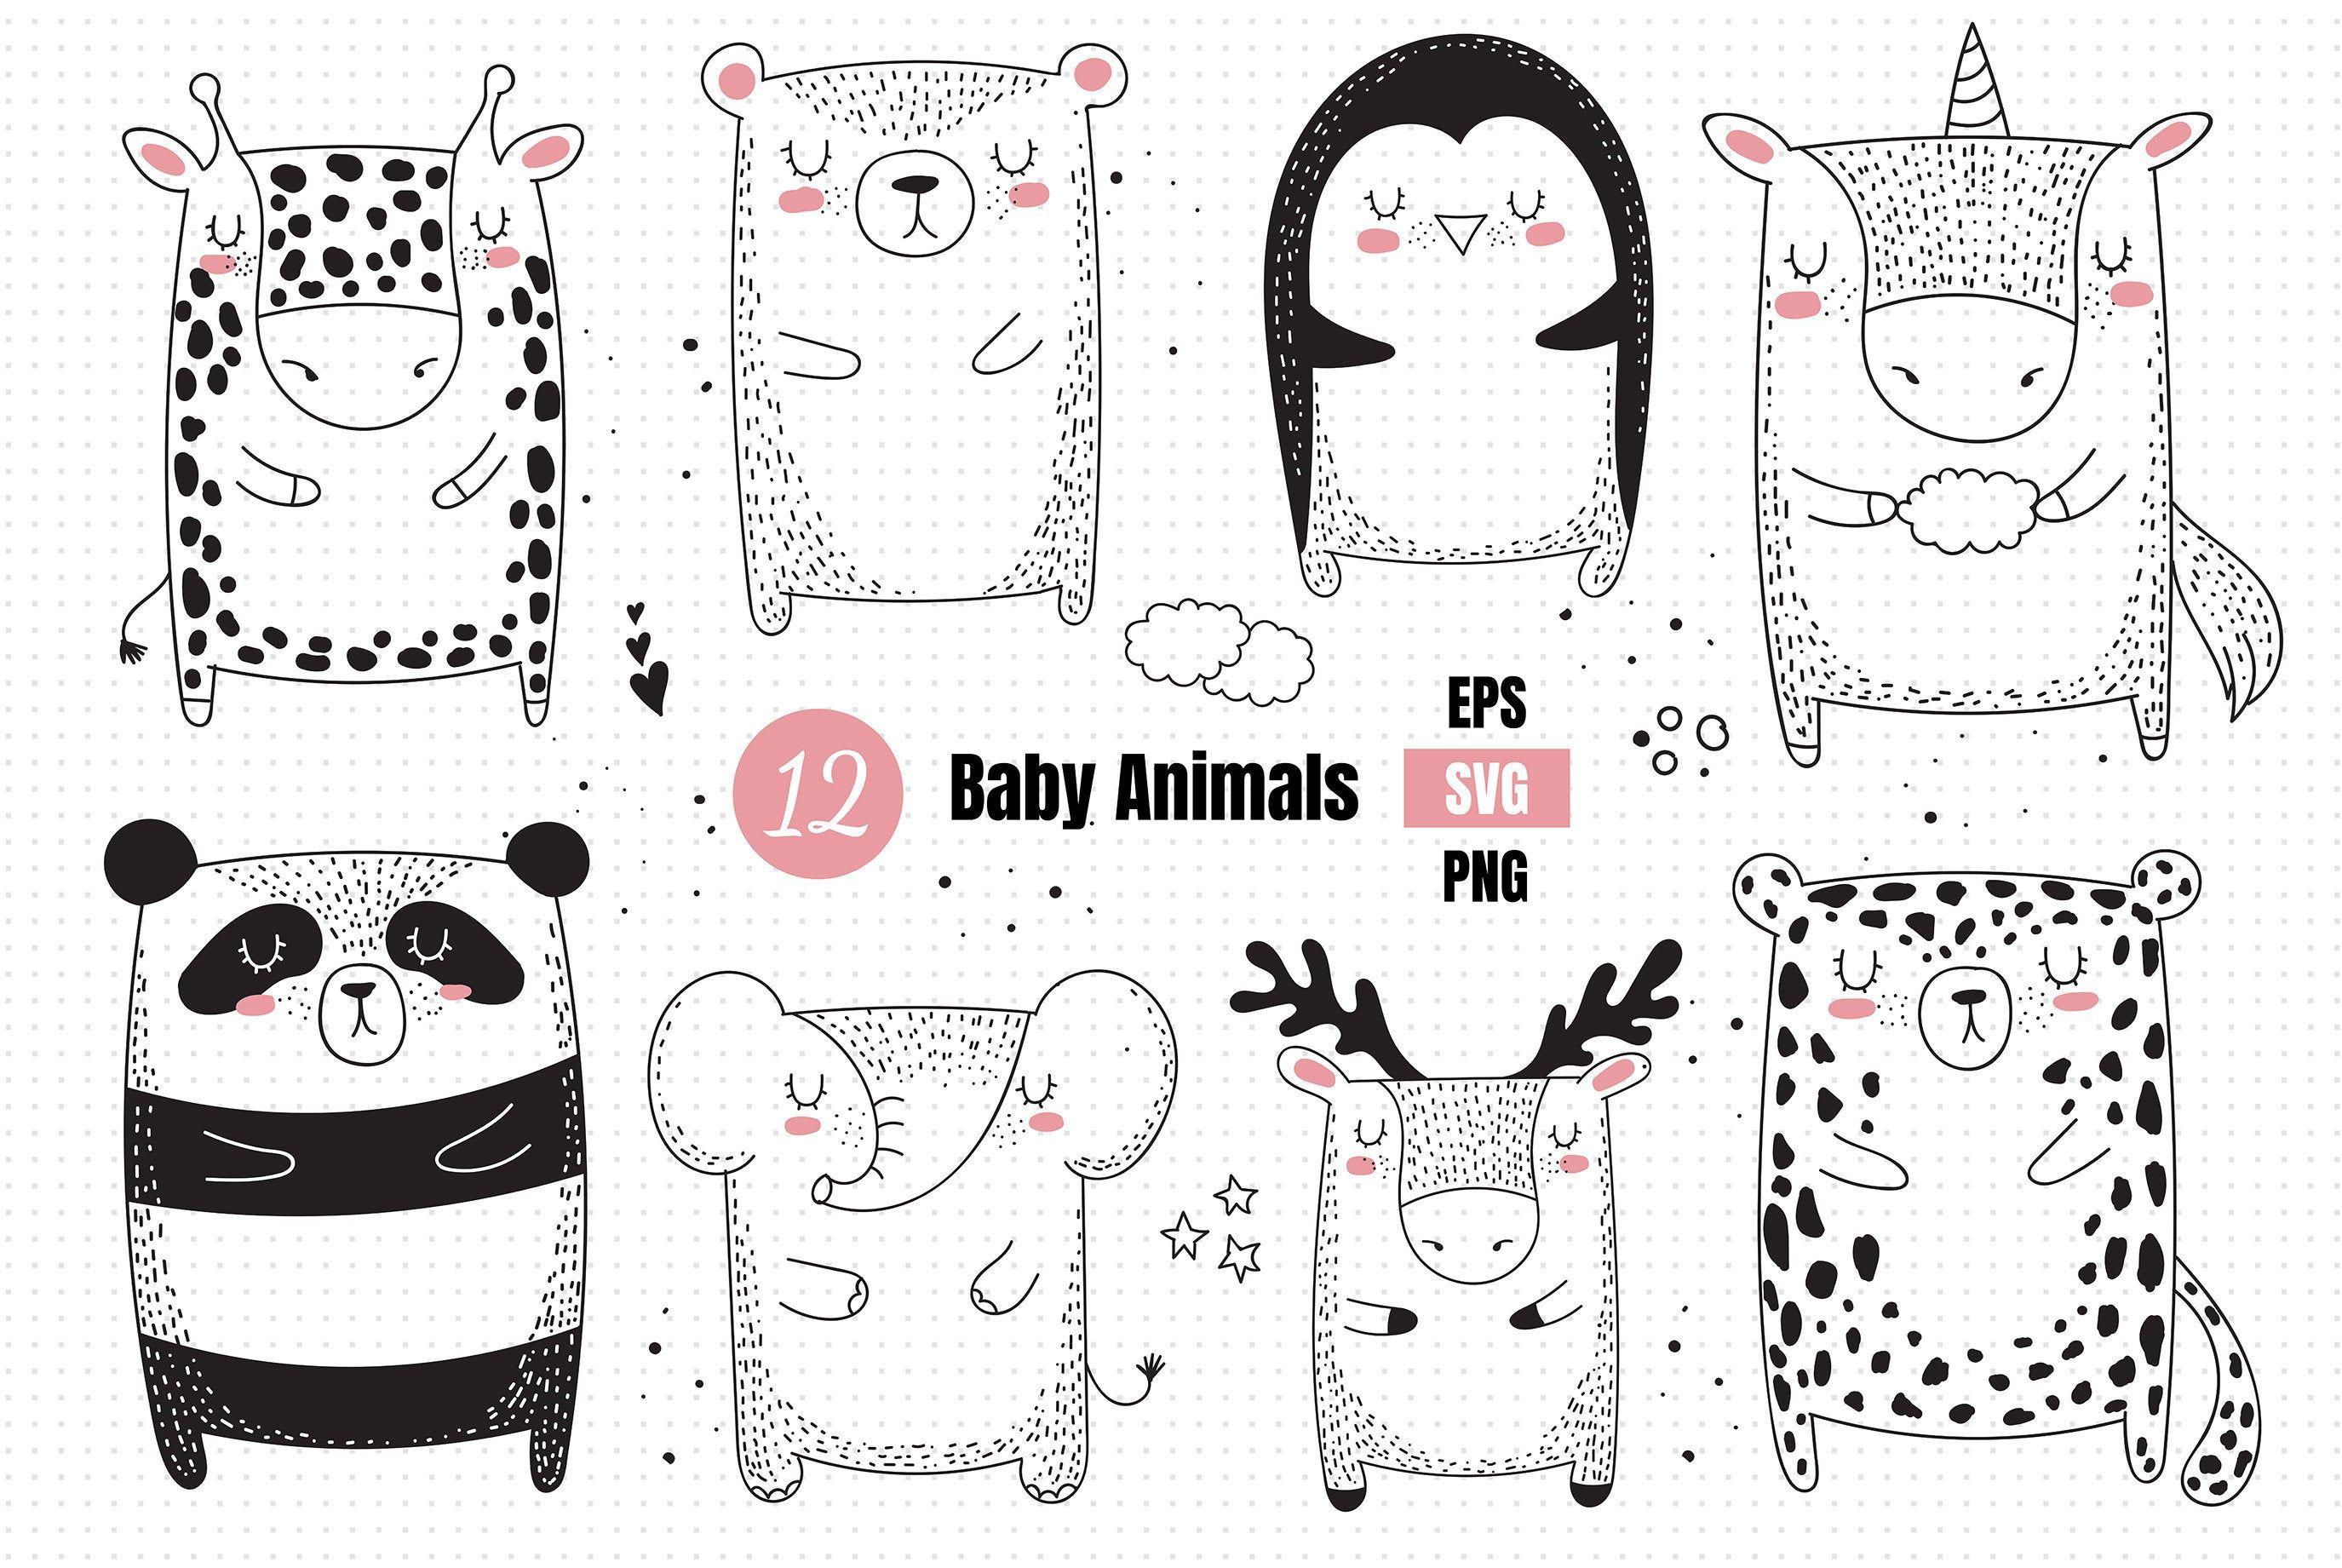 Baby Cute Animals Svg Woodland Animals Clipart Line Art Svg Etsy In 2021 Woodland Animals Clipart Cute Animals Minimalist Animal